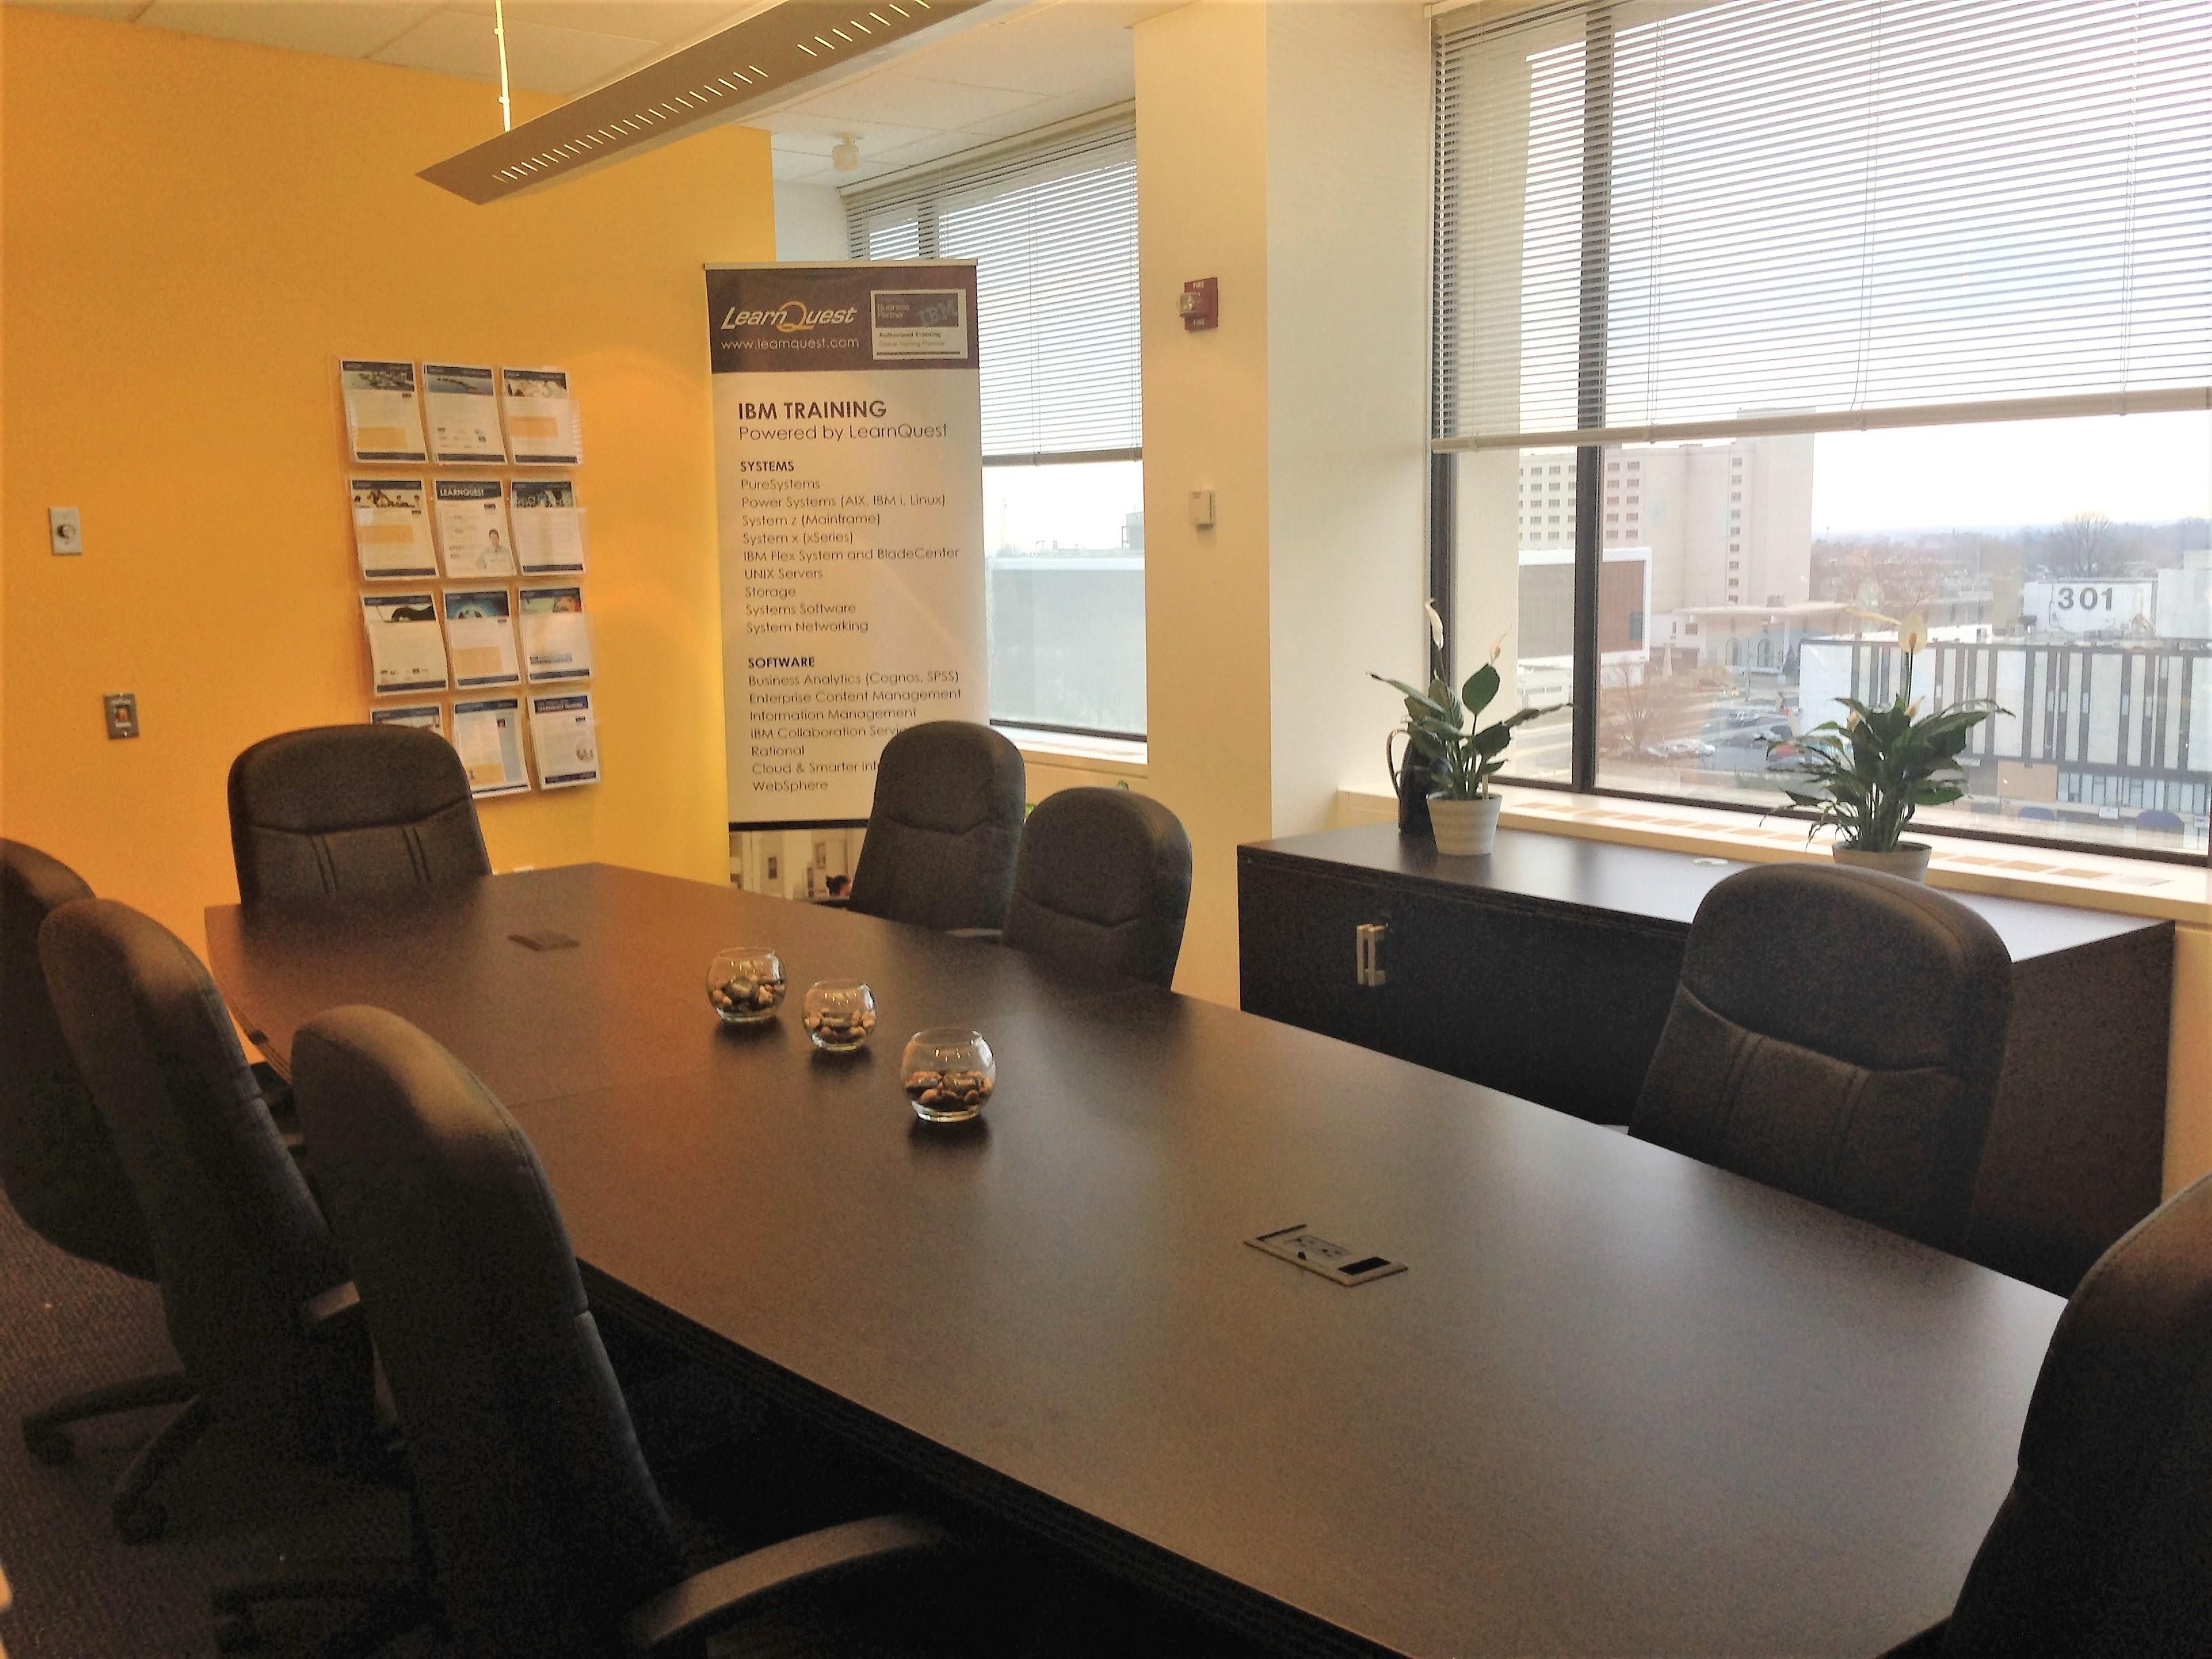 Learnquest, Inc. - Meeting Room 1